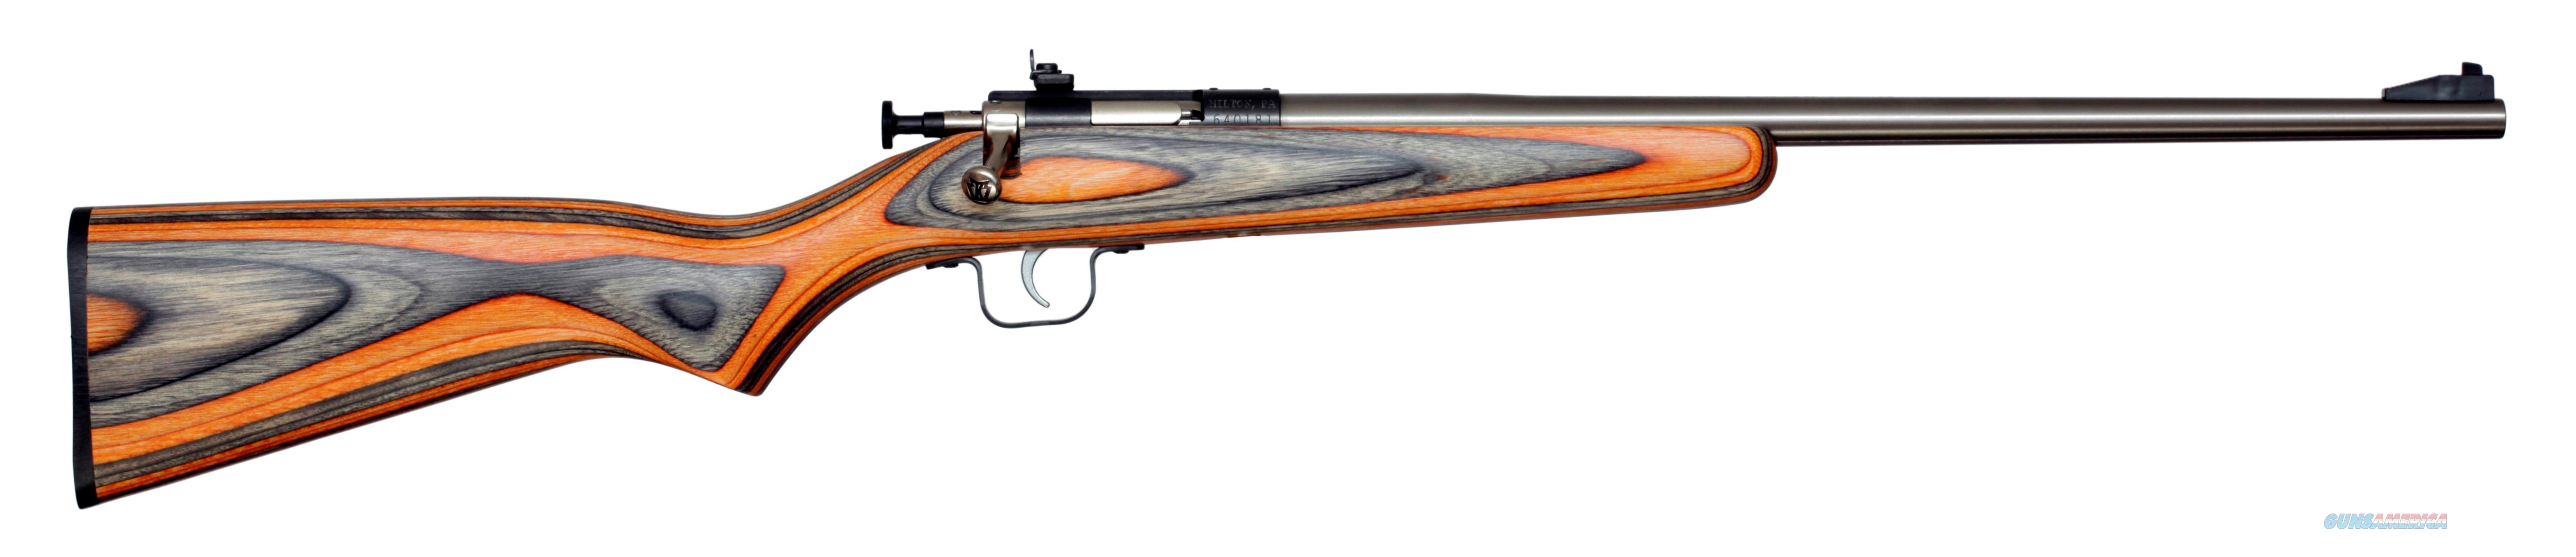 Crickett 22Lr Ss/Blk-Ornge Lam KSA2232  Guns > Rifles > K Misc Rifles